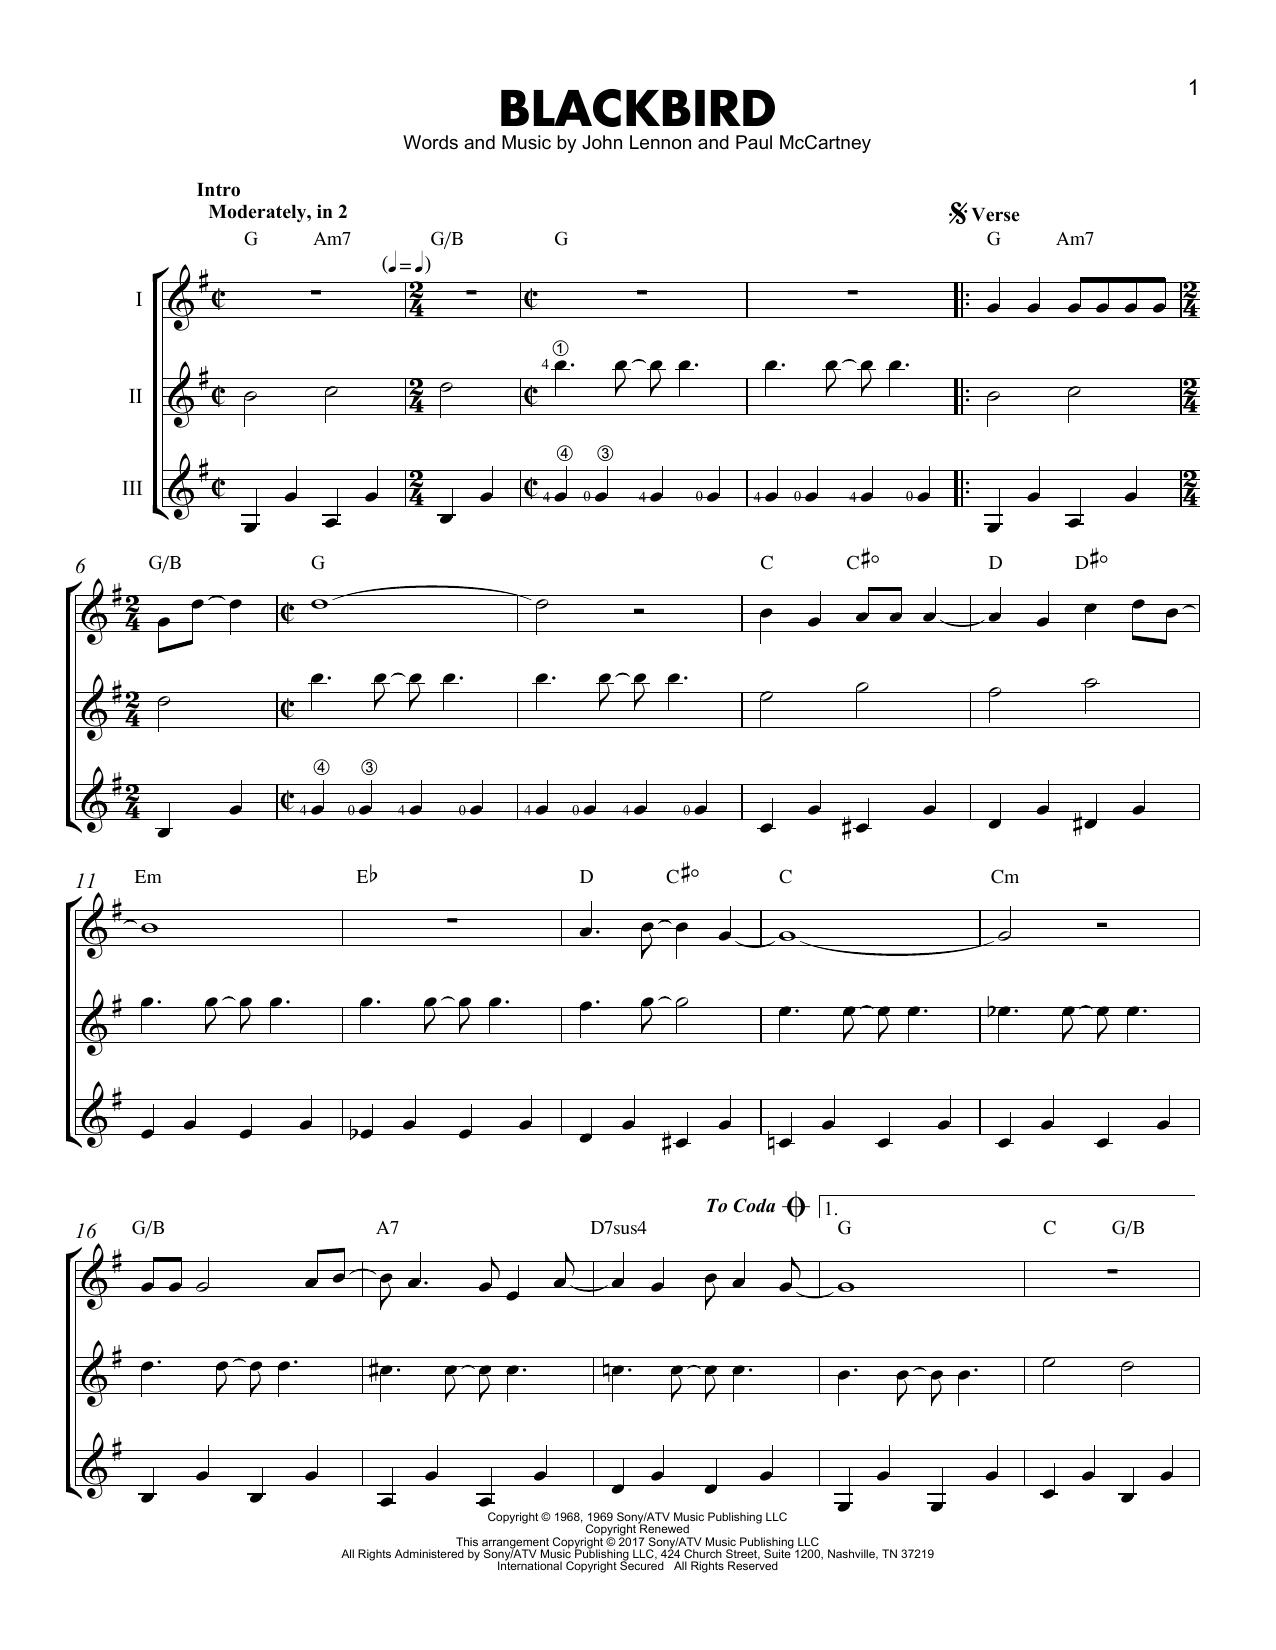 The Beatles Blackbird Sheet Music Notes Chords Printable Pop